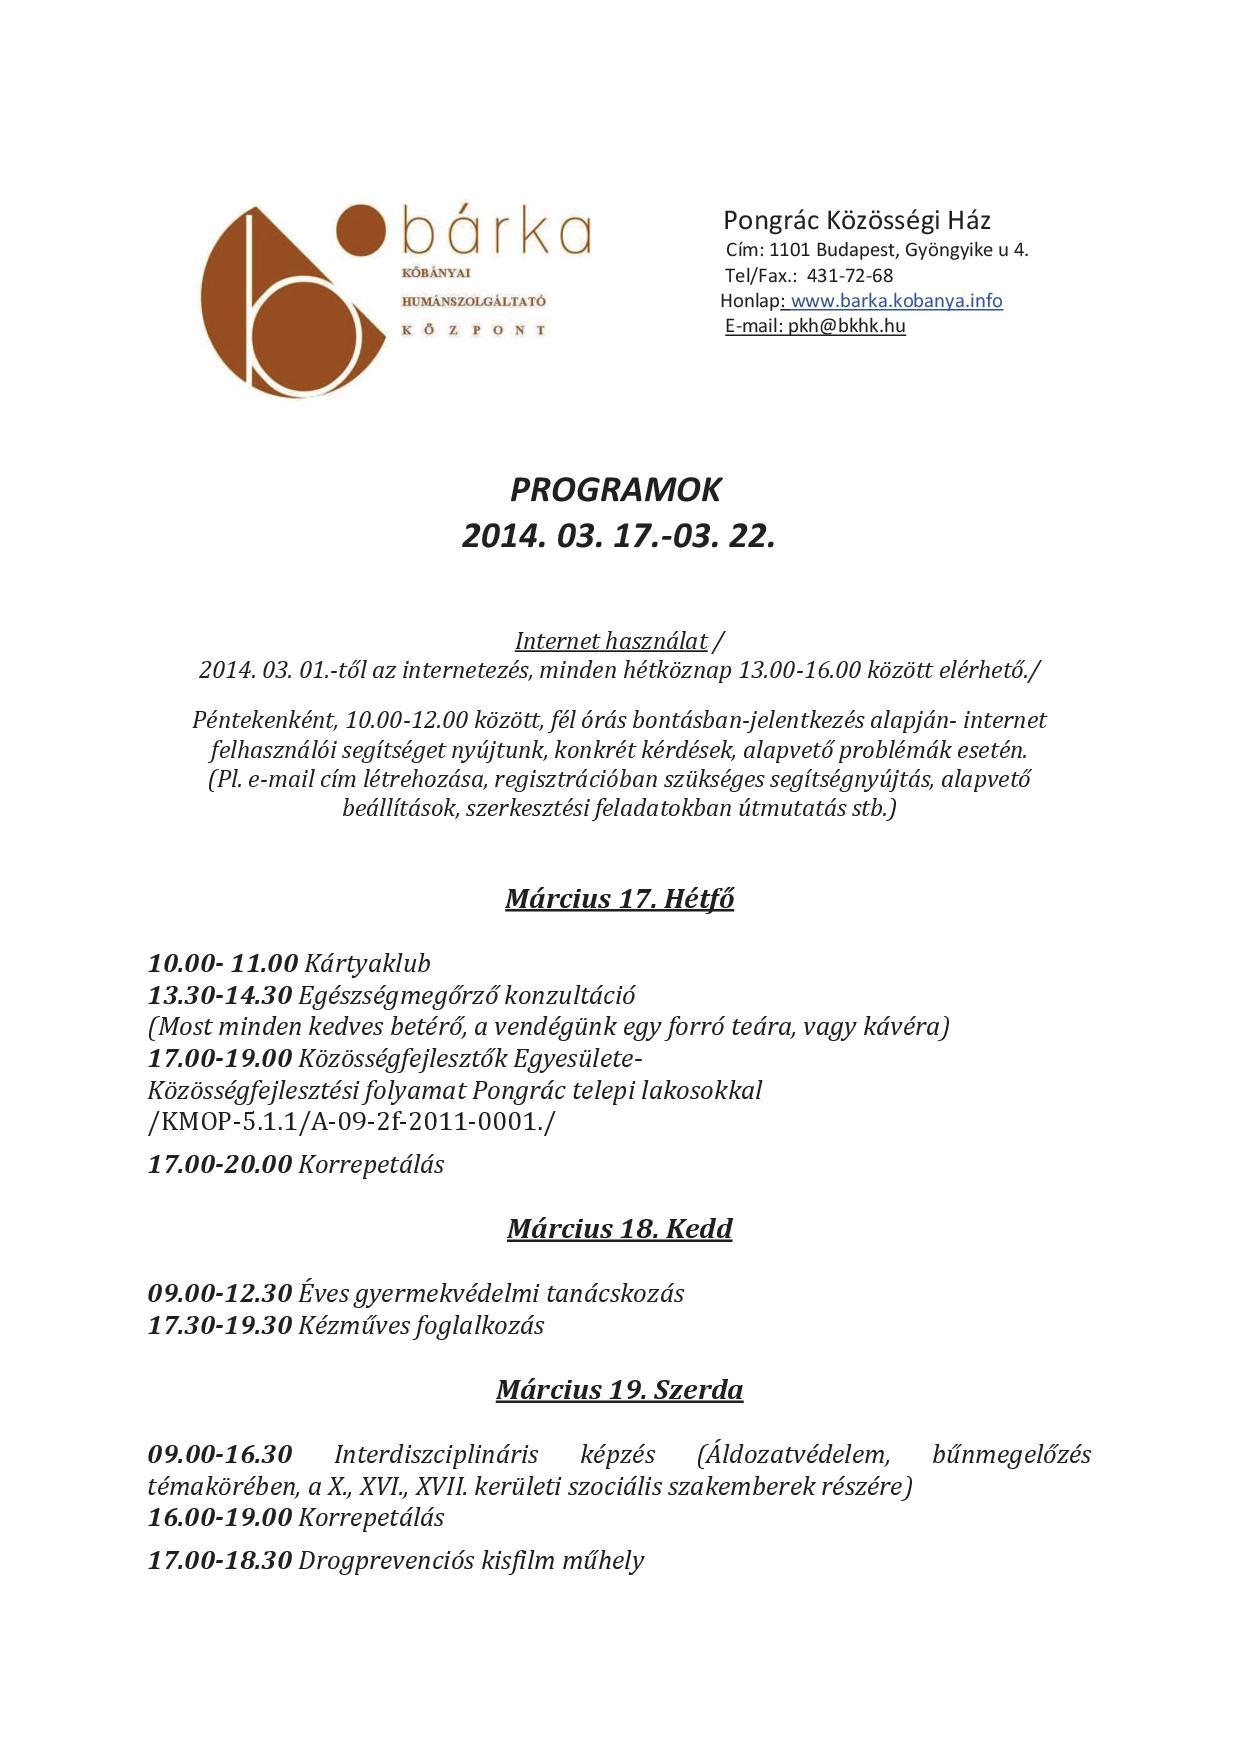 2014.03.16_PKH_heti program_01